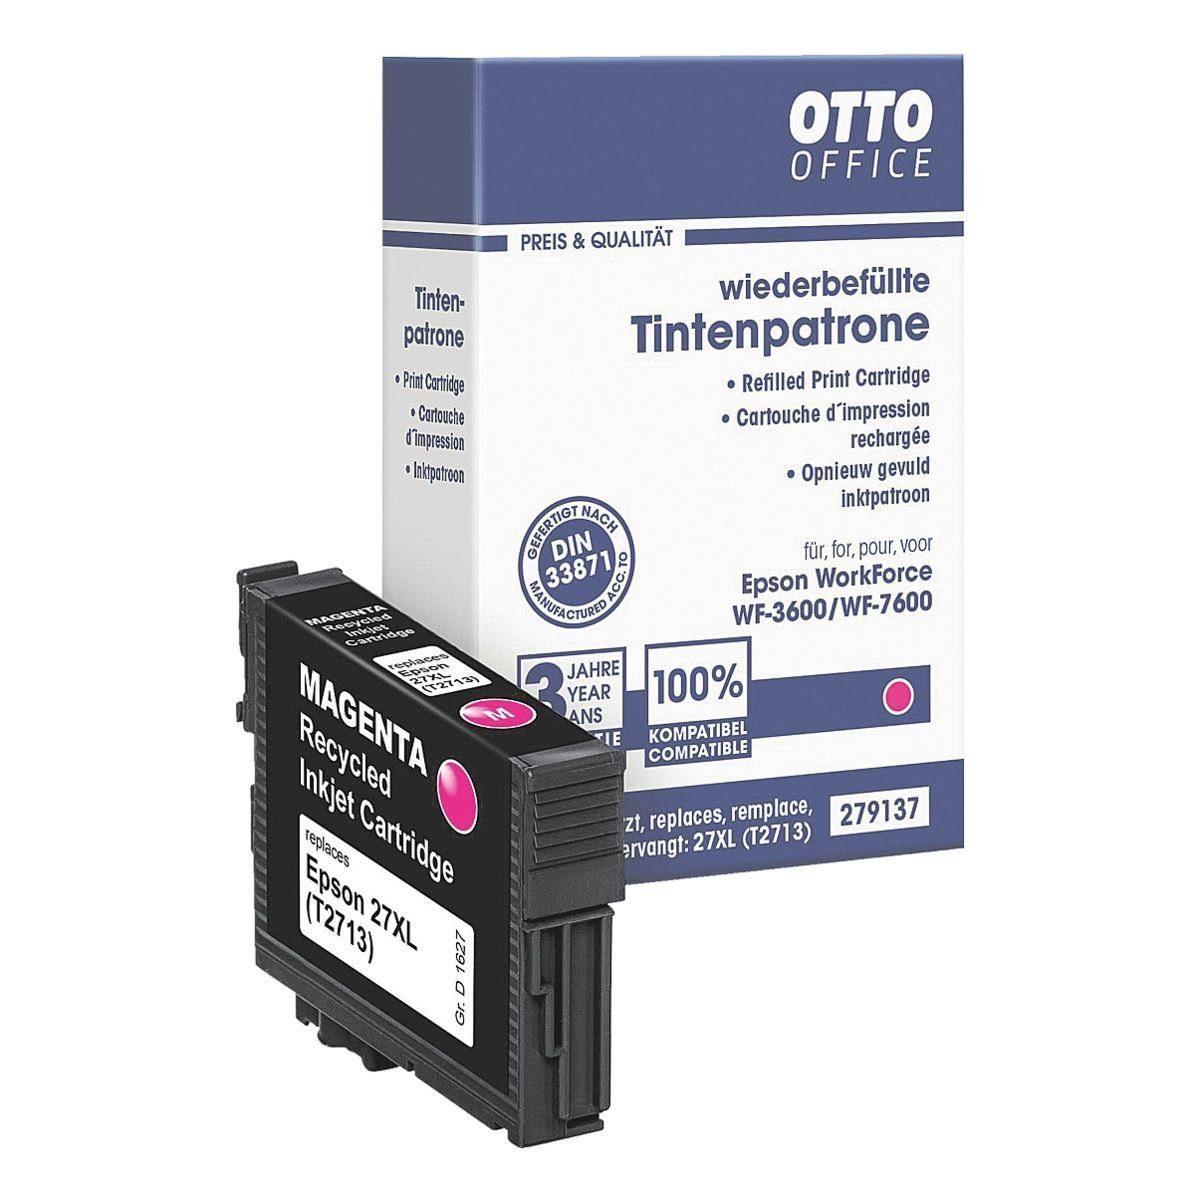 OTTO Office Standard Tintenpatrone ersetzt Epson »T2713 XL«